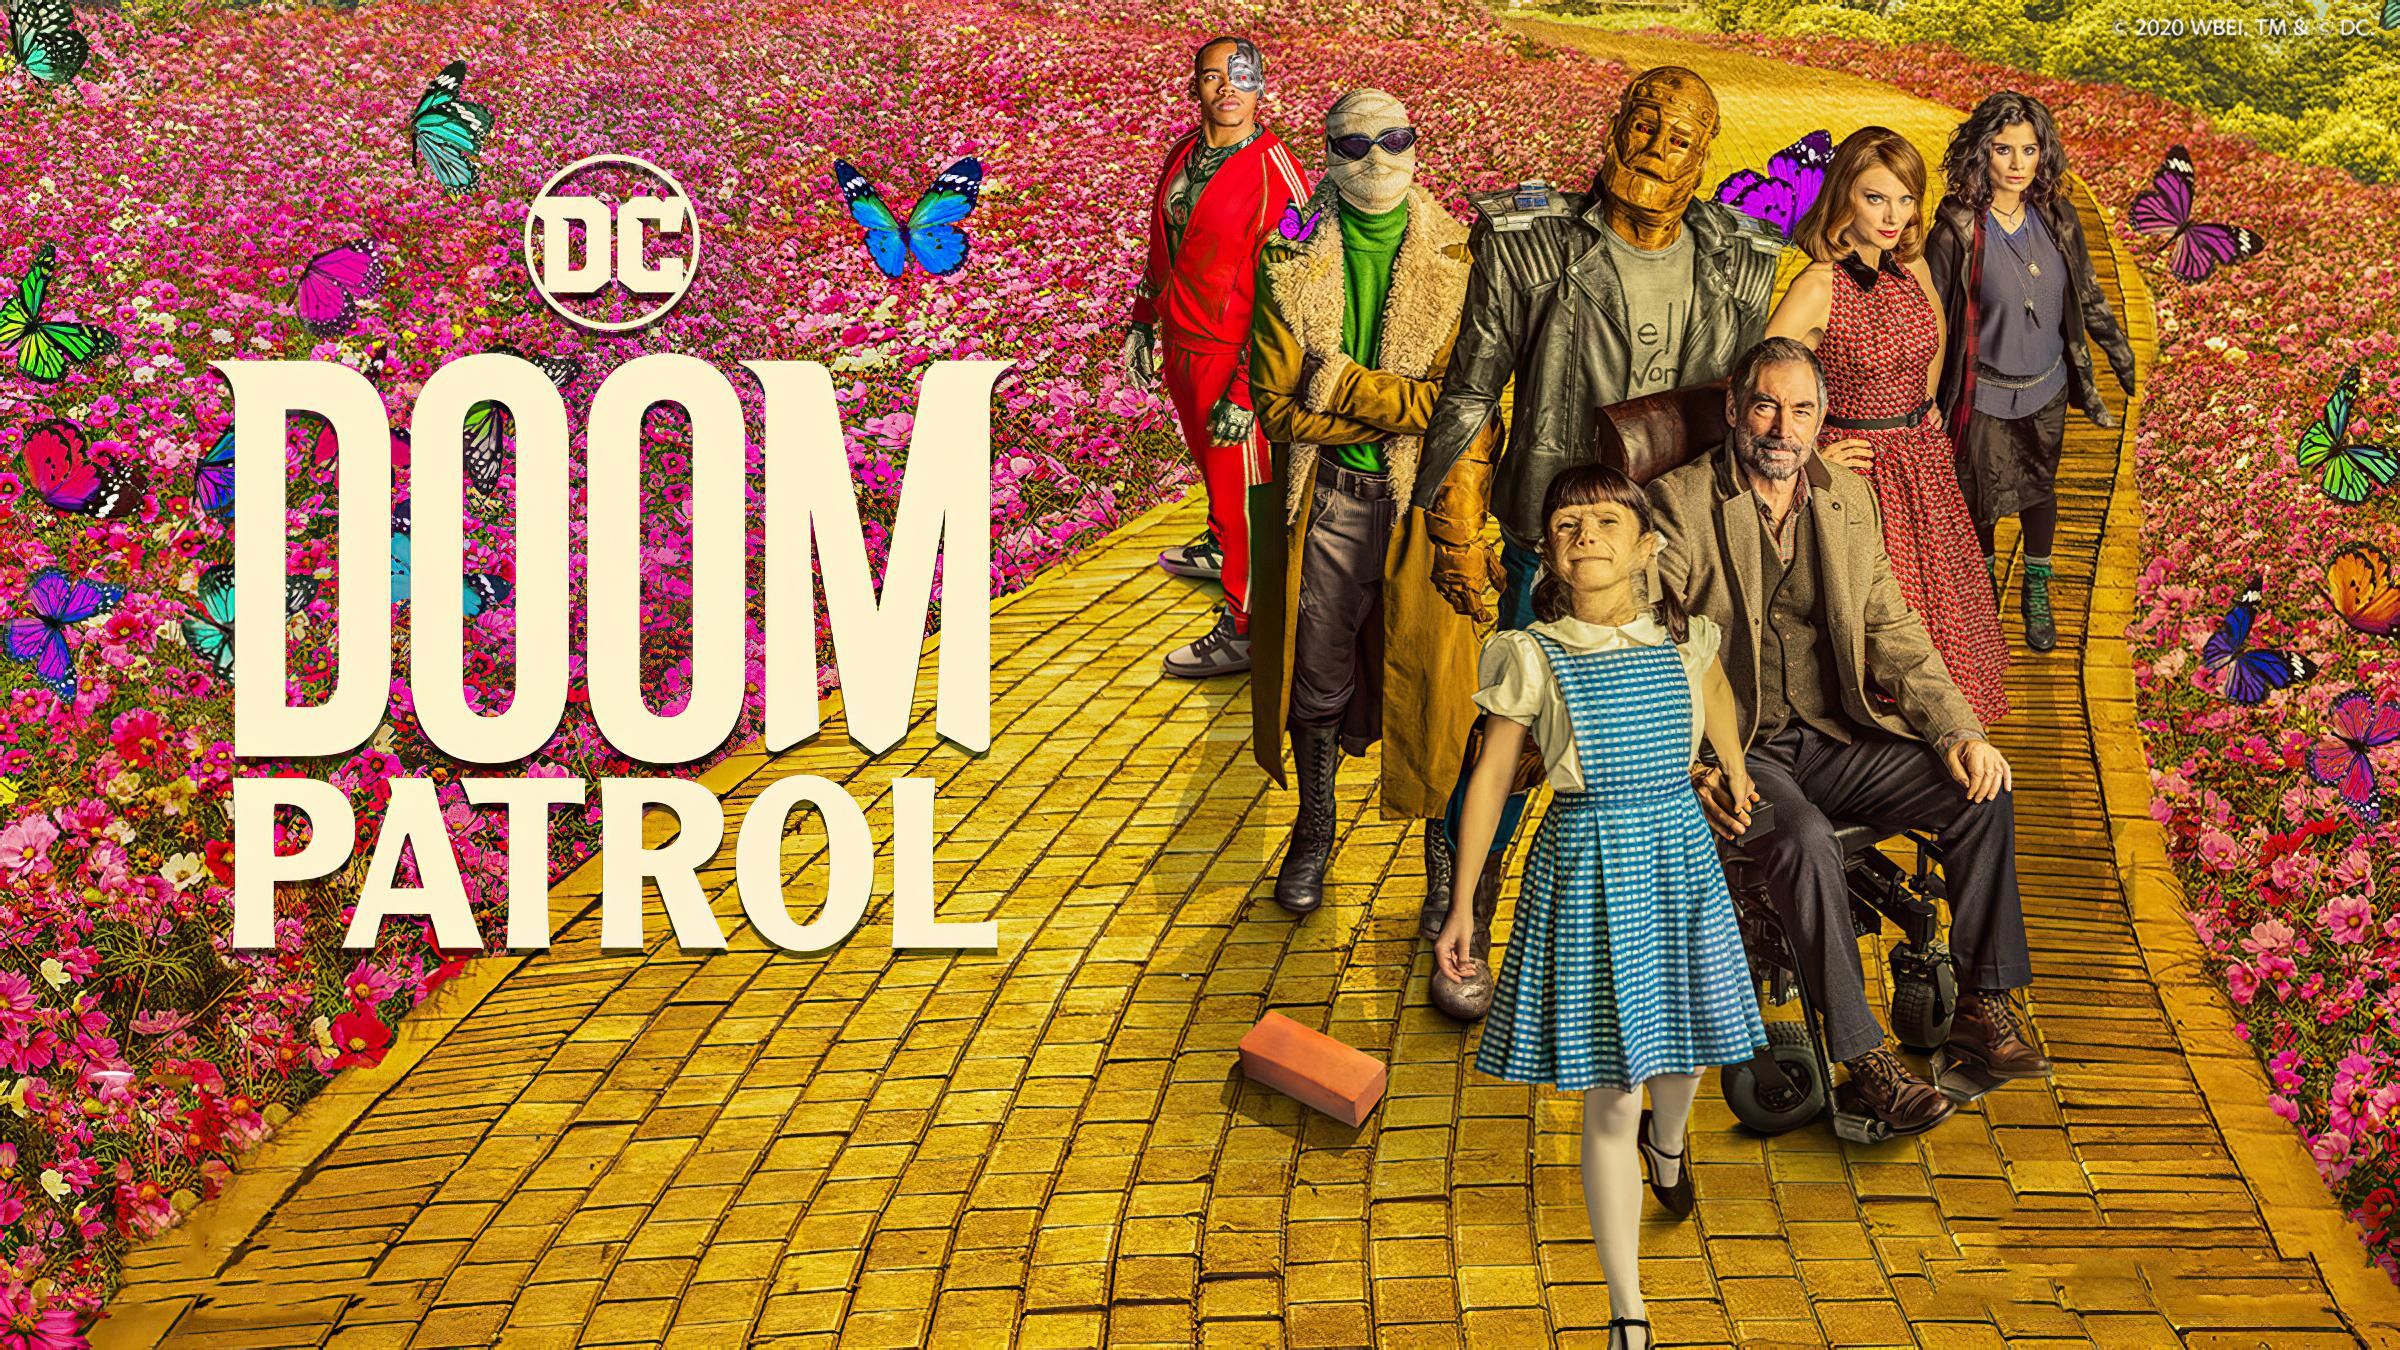 doom patrol season 2 dorothy friends